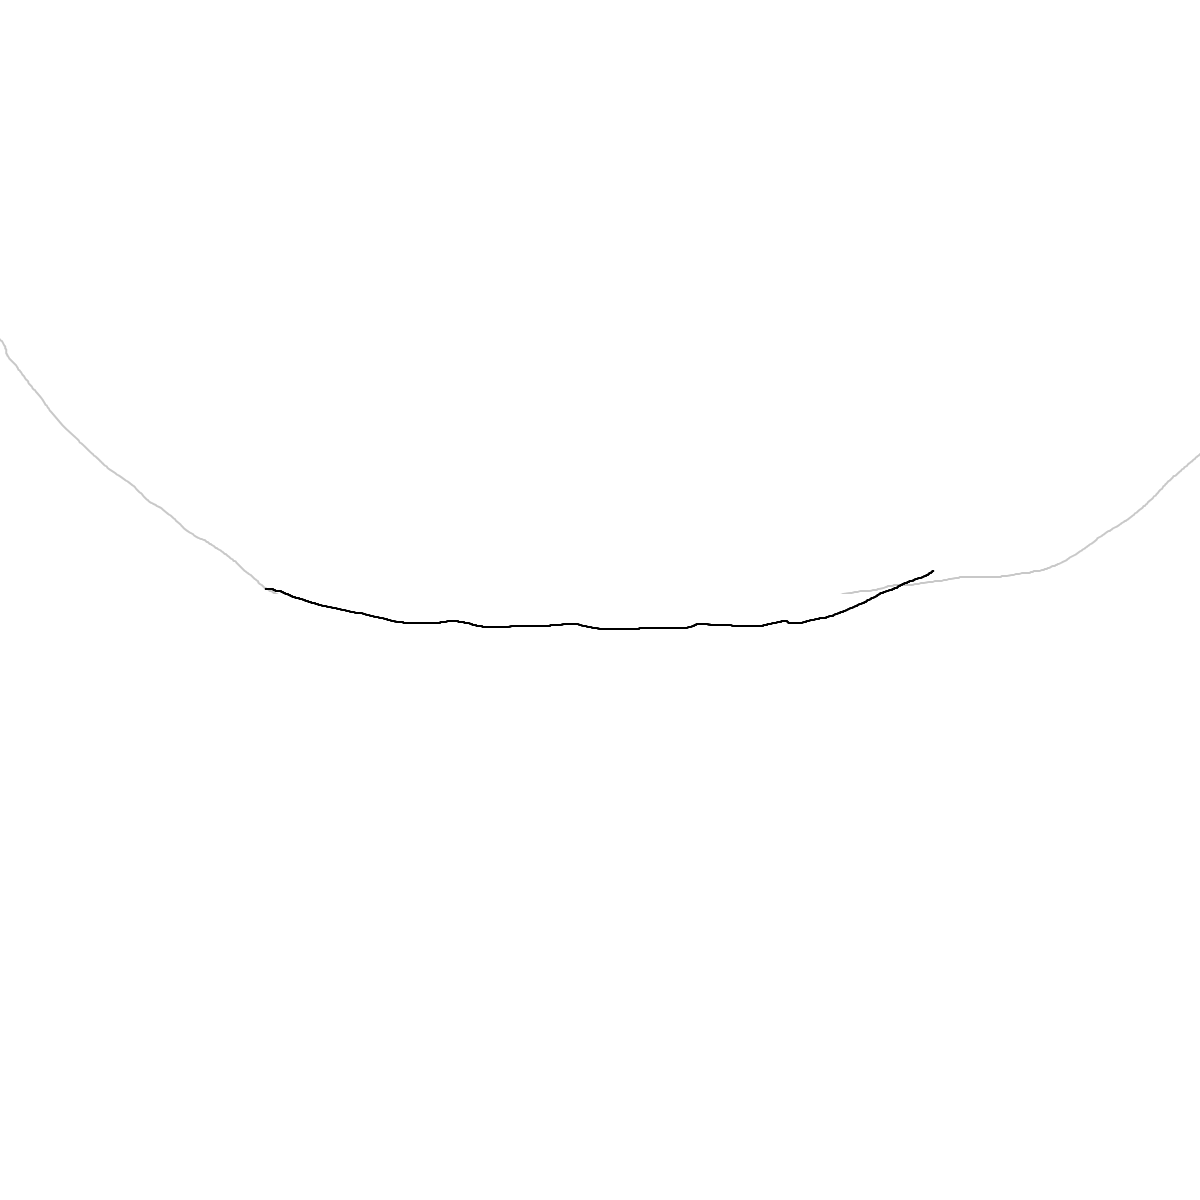 BAAAM drawing#16078 lat:39.0971069335937500lng: -84.5064086914062500